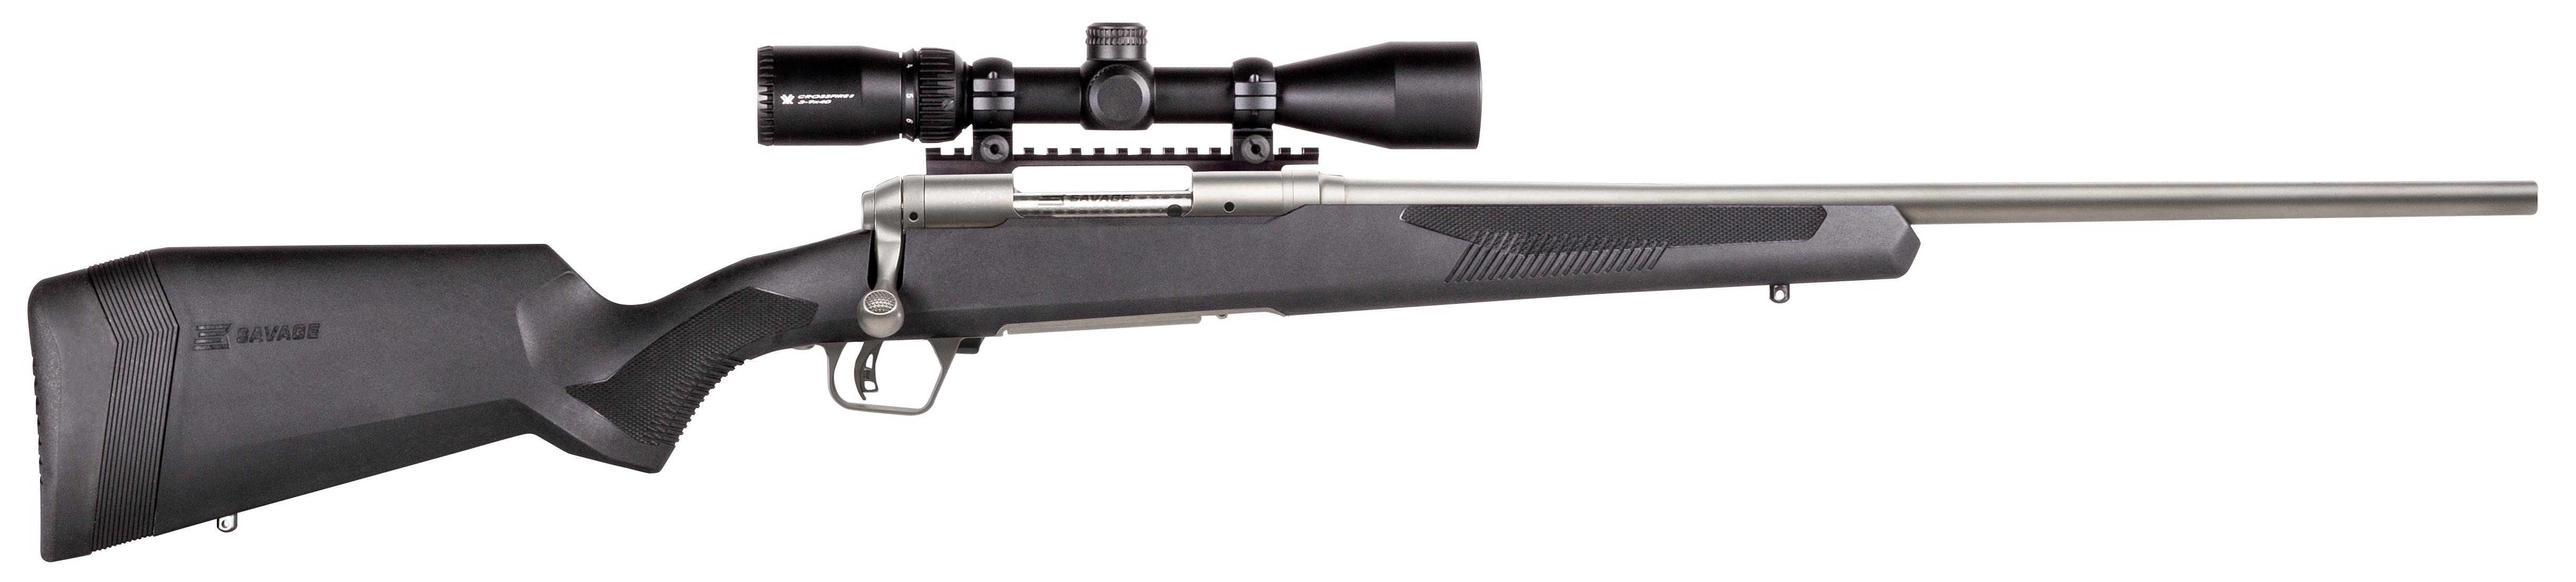 Savage Arms 110 Apex Storm XP 22-250